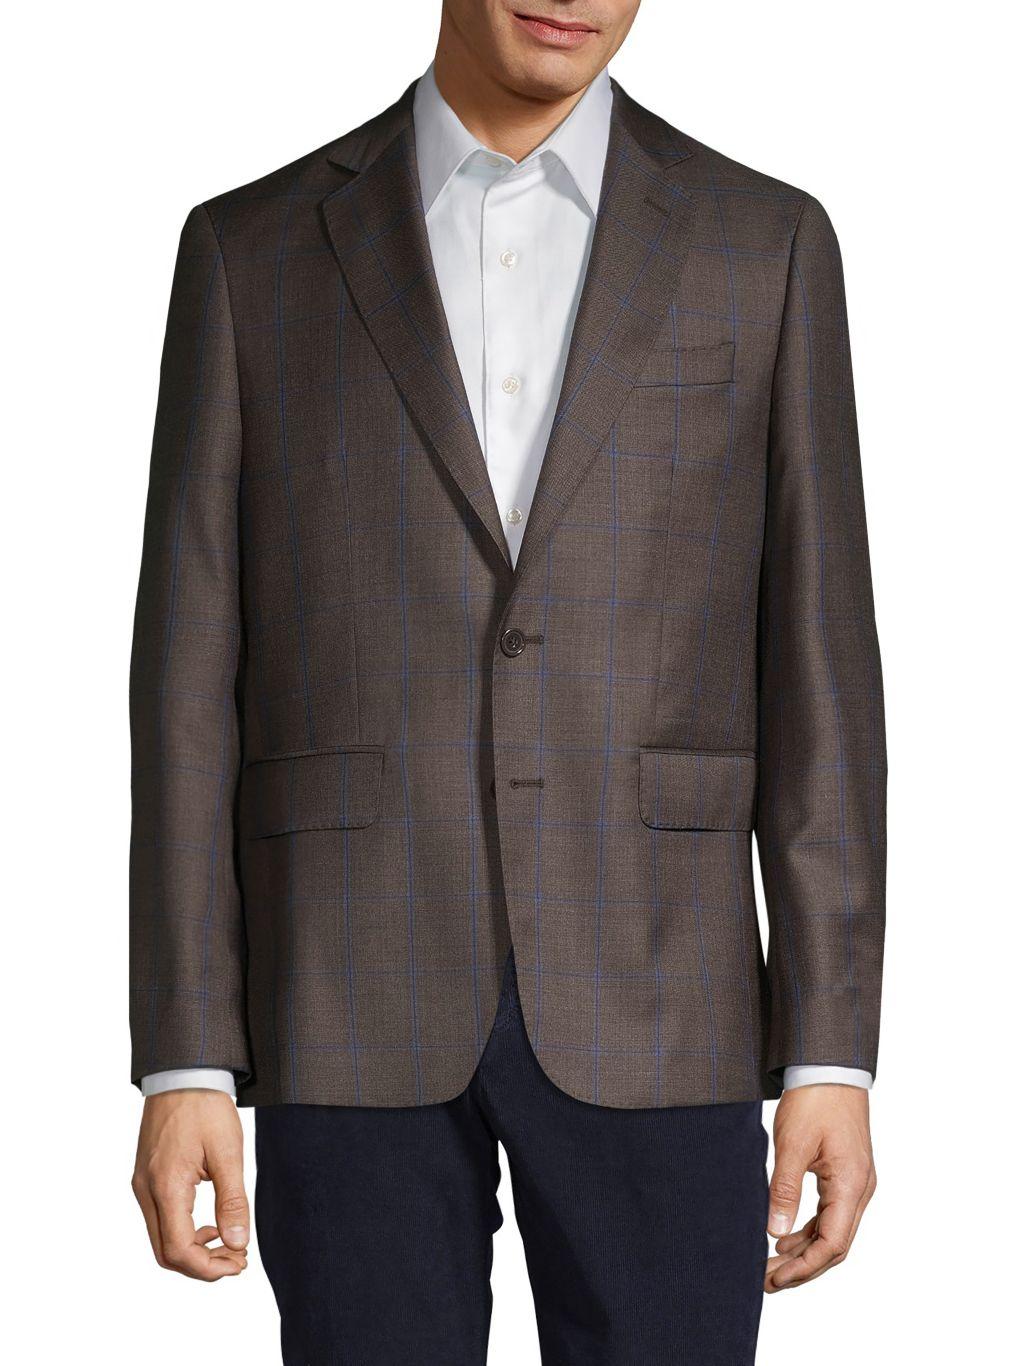 Components by JM Windowpane Check Virgin Wool Sportcoat